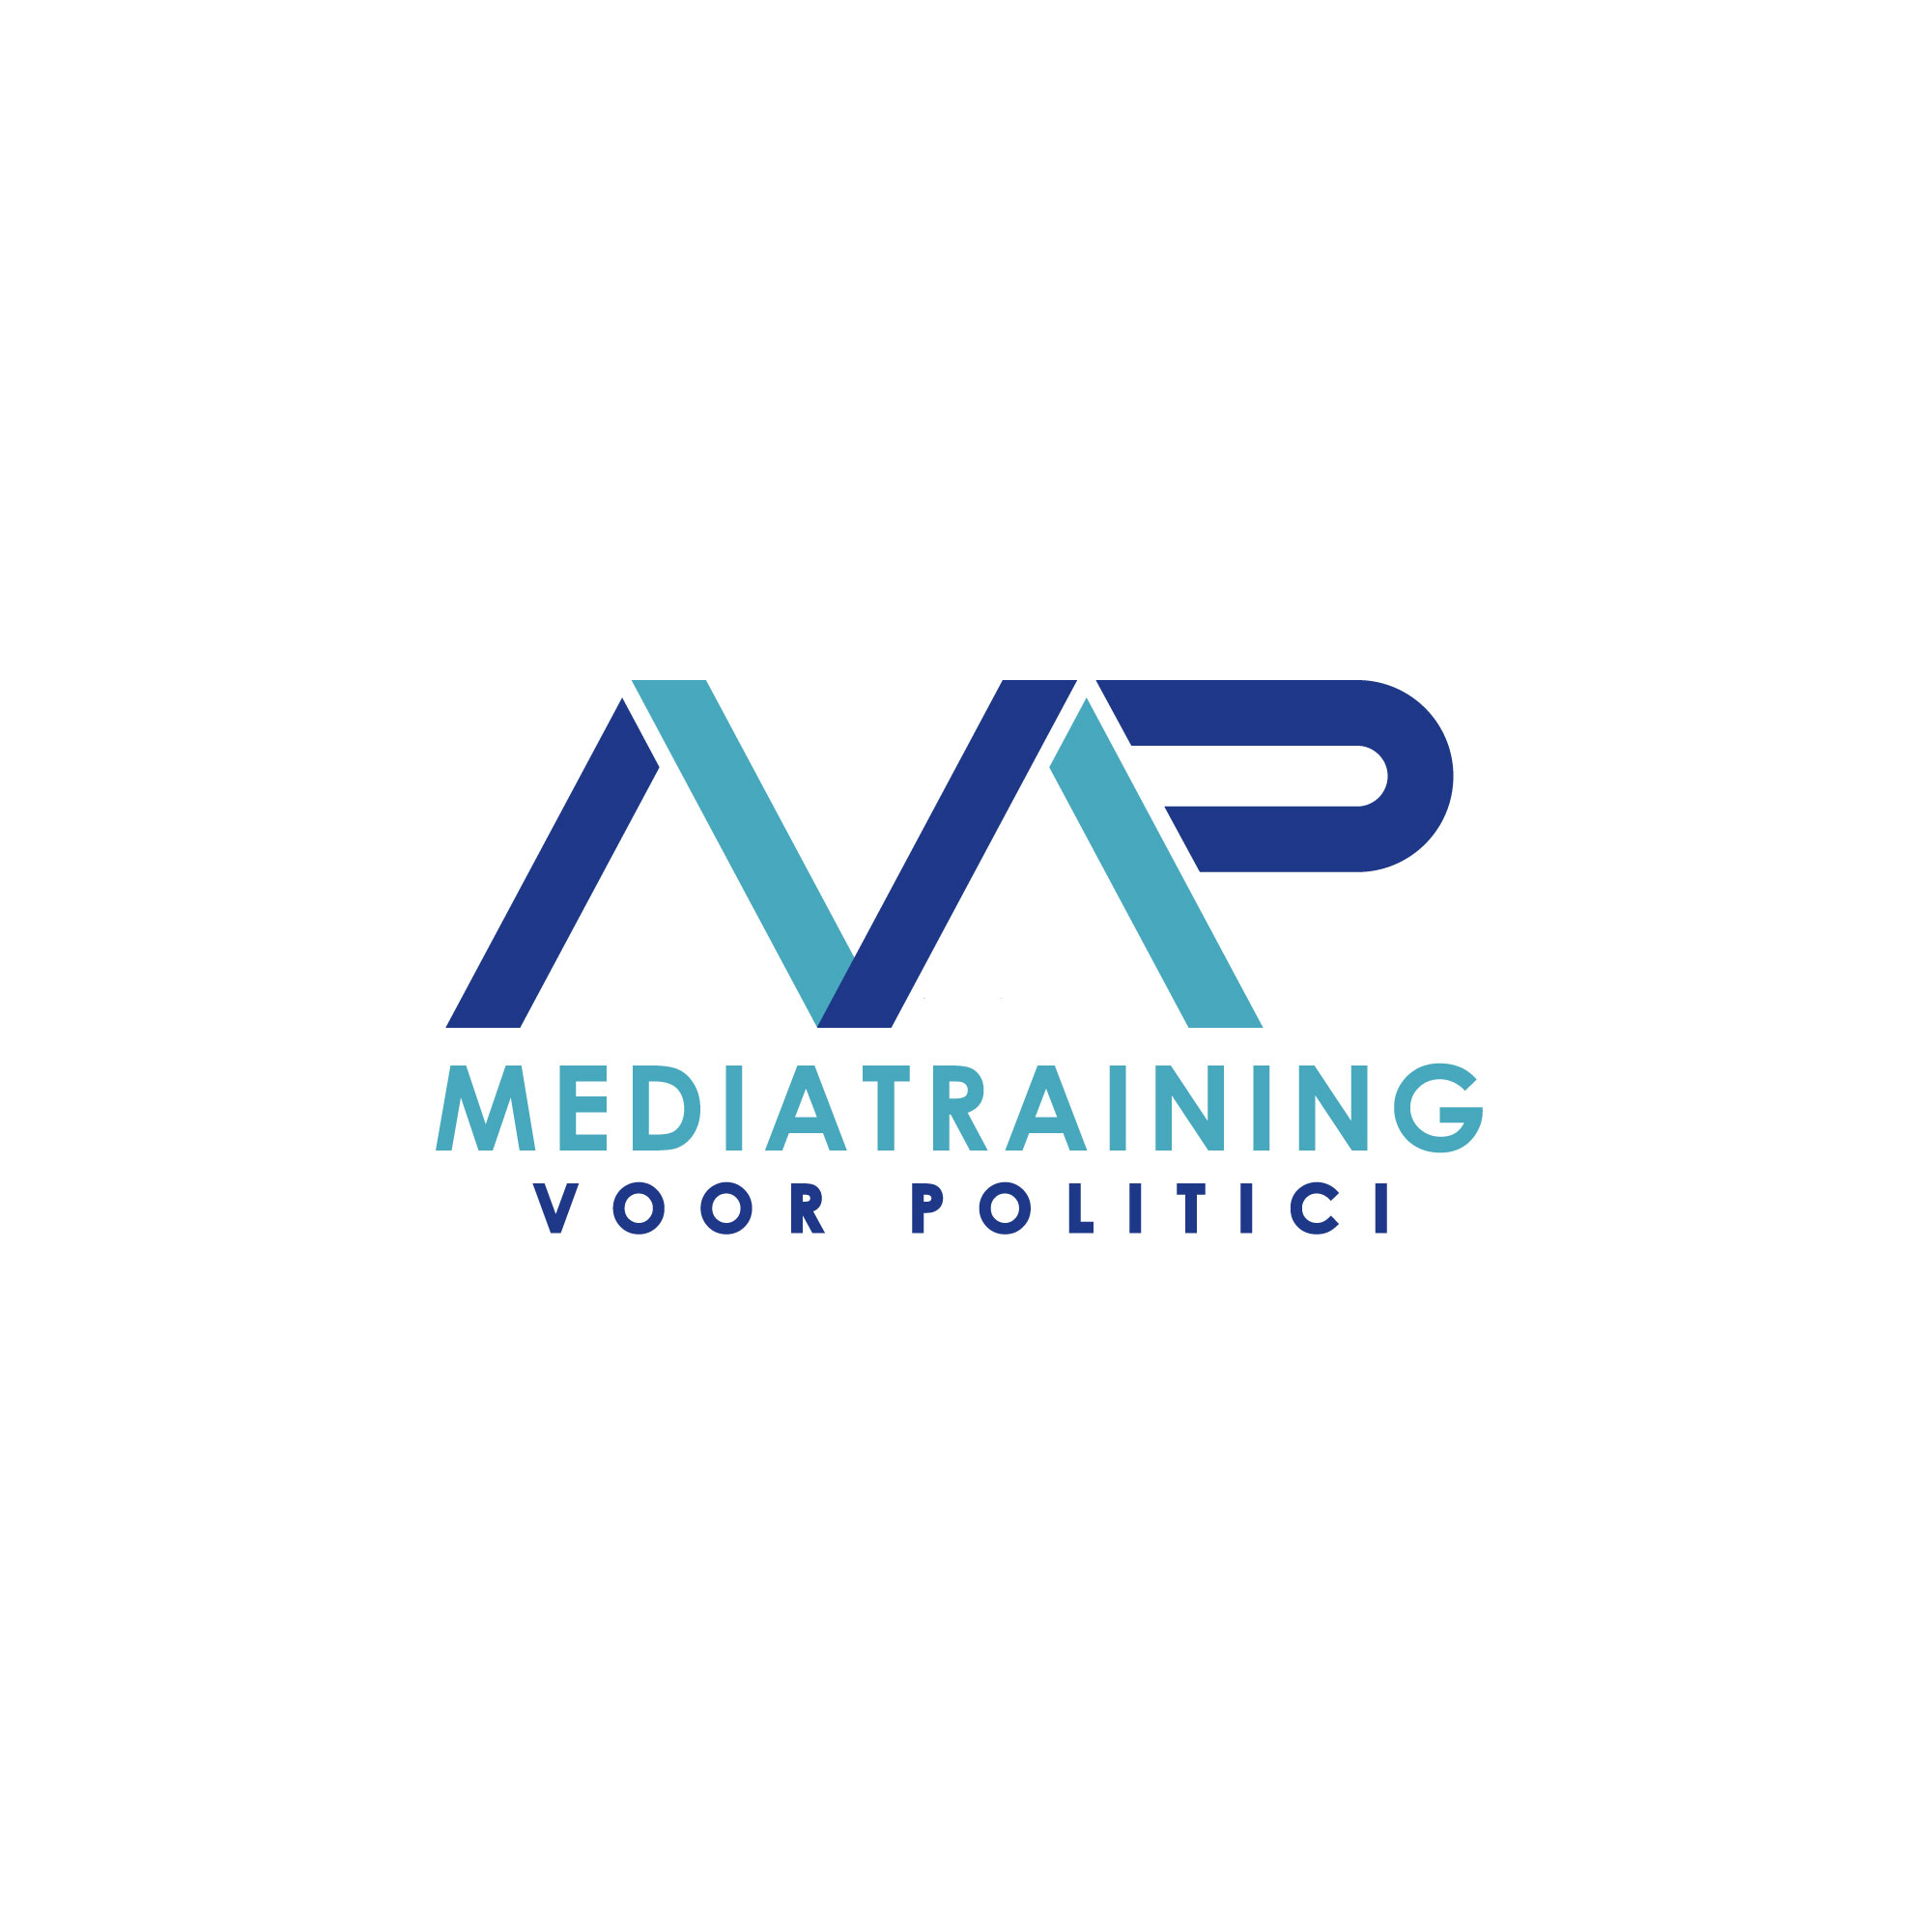 Mediatraining voor politici